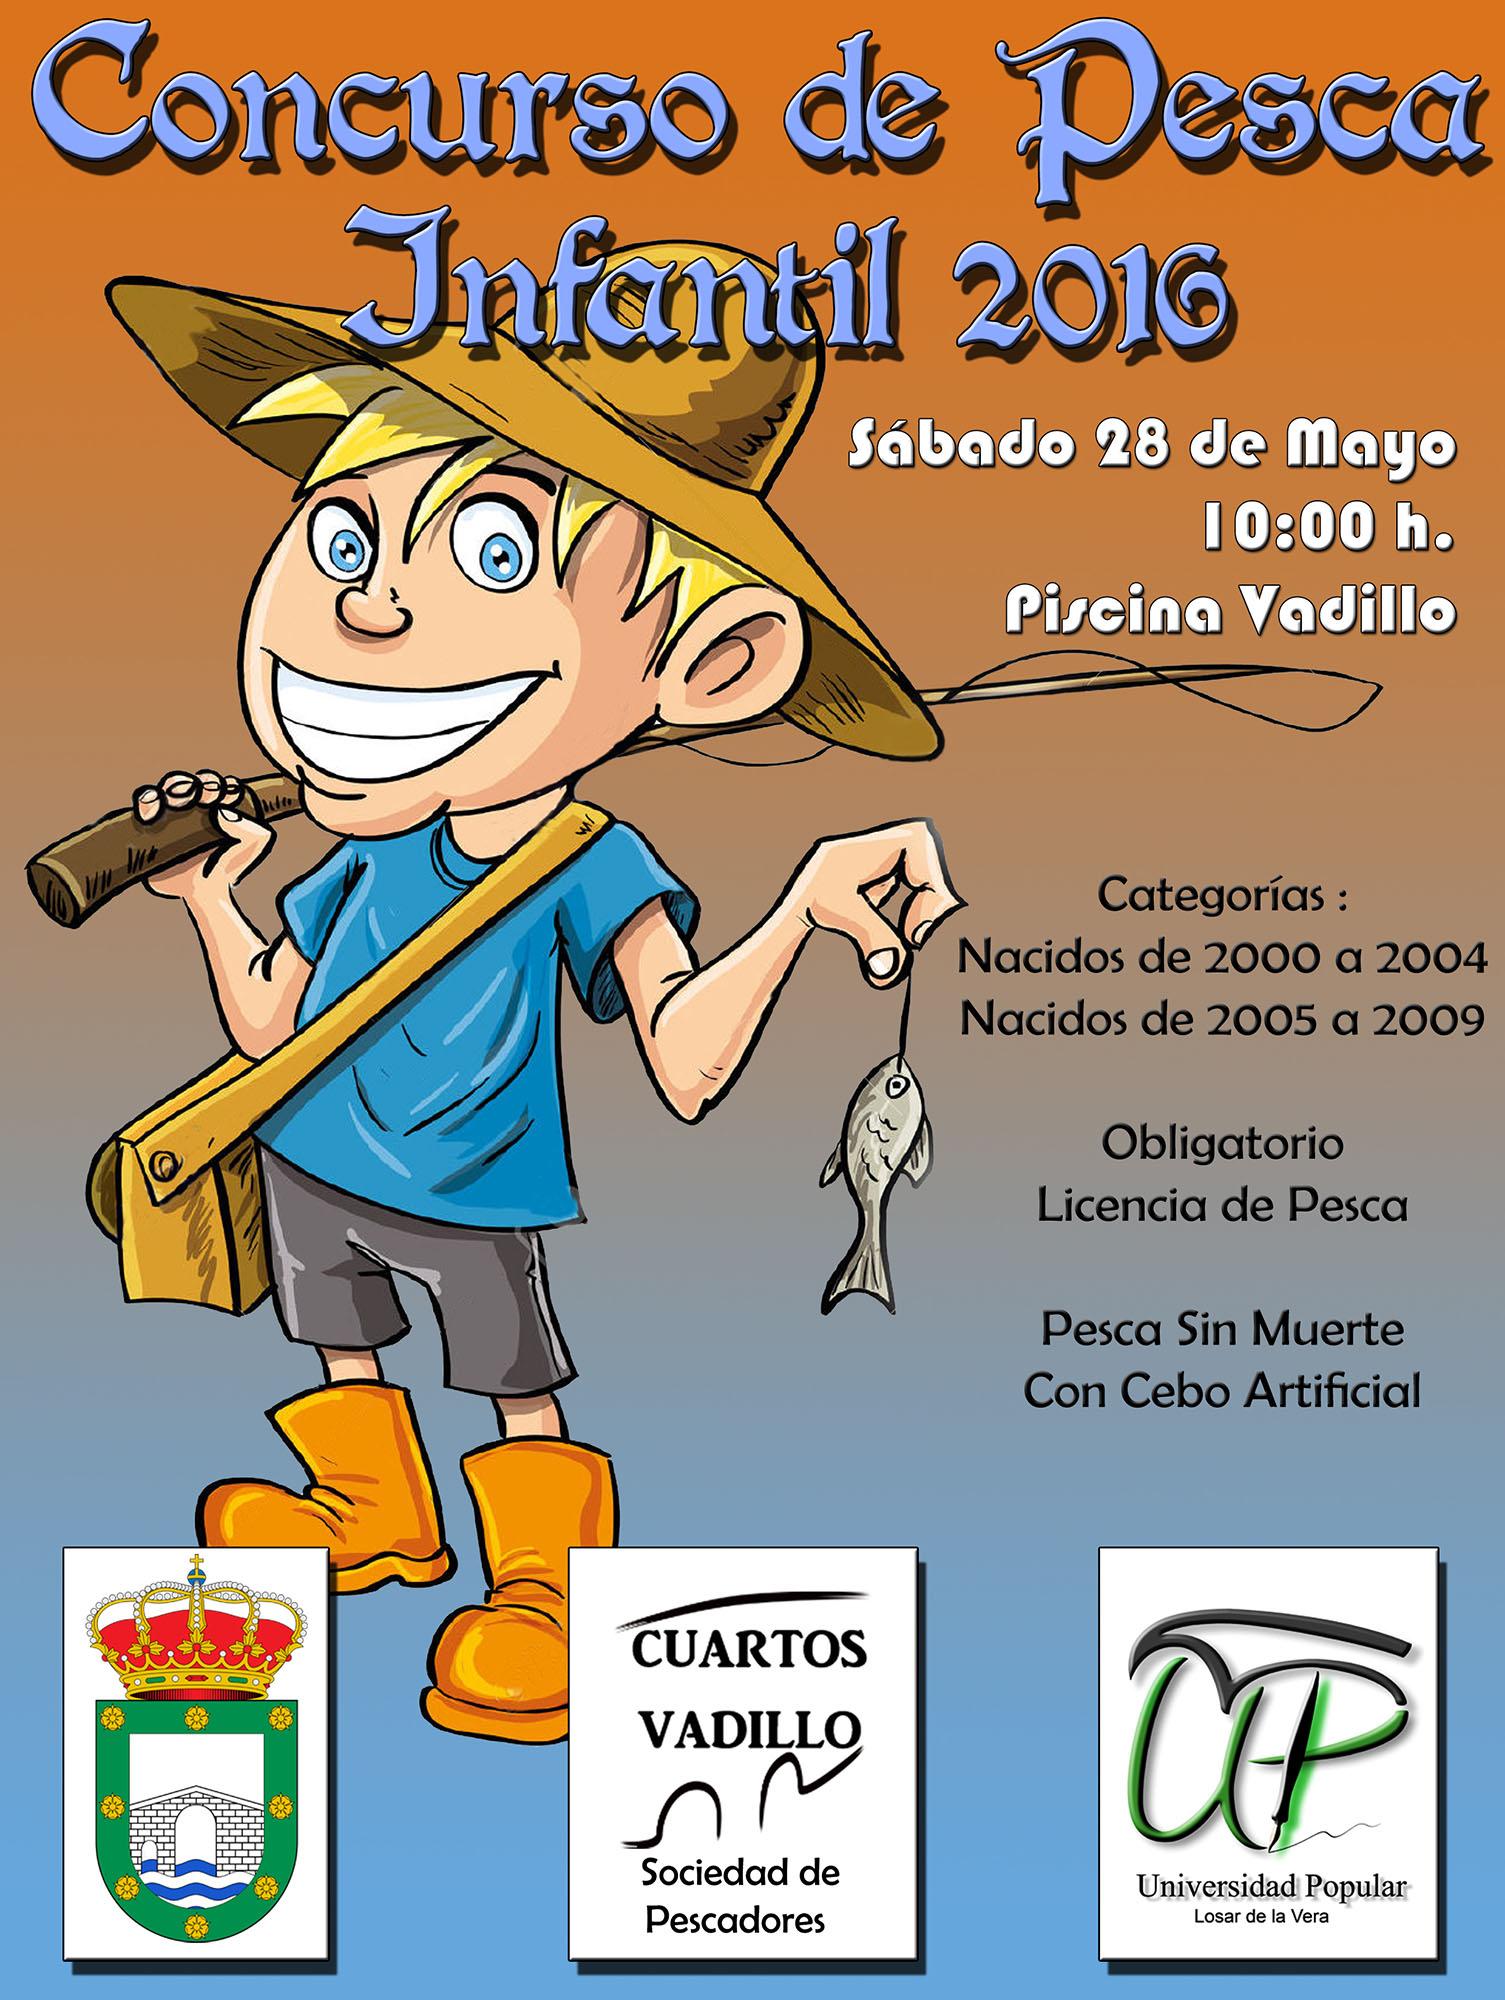 Concurso de pesca infantil 2016 for Concurso de docencia 2016